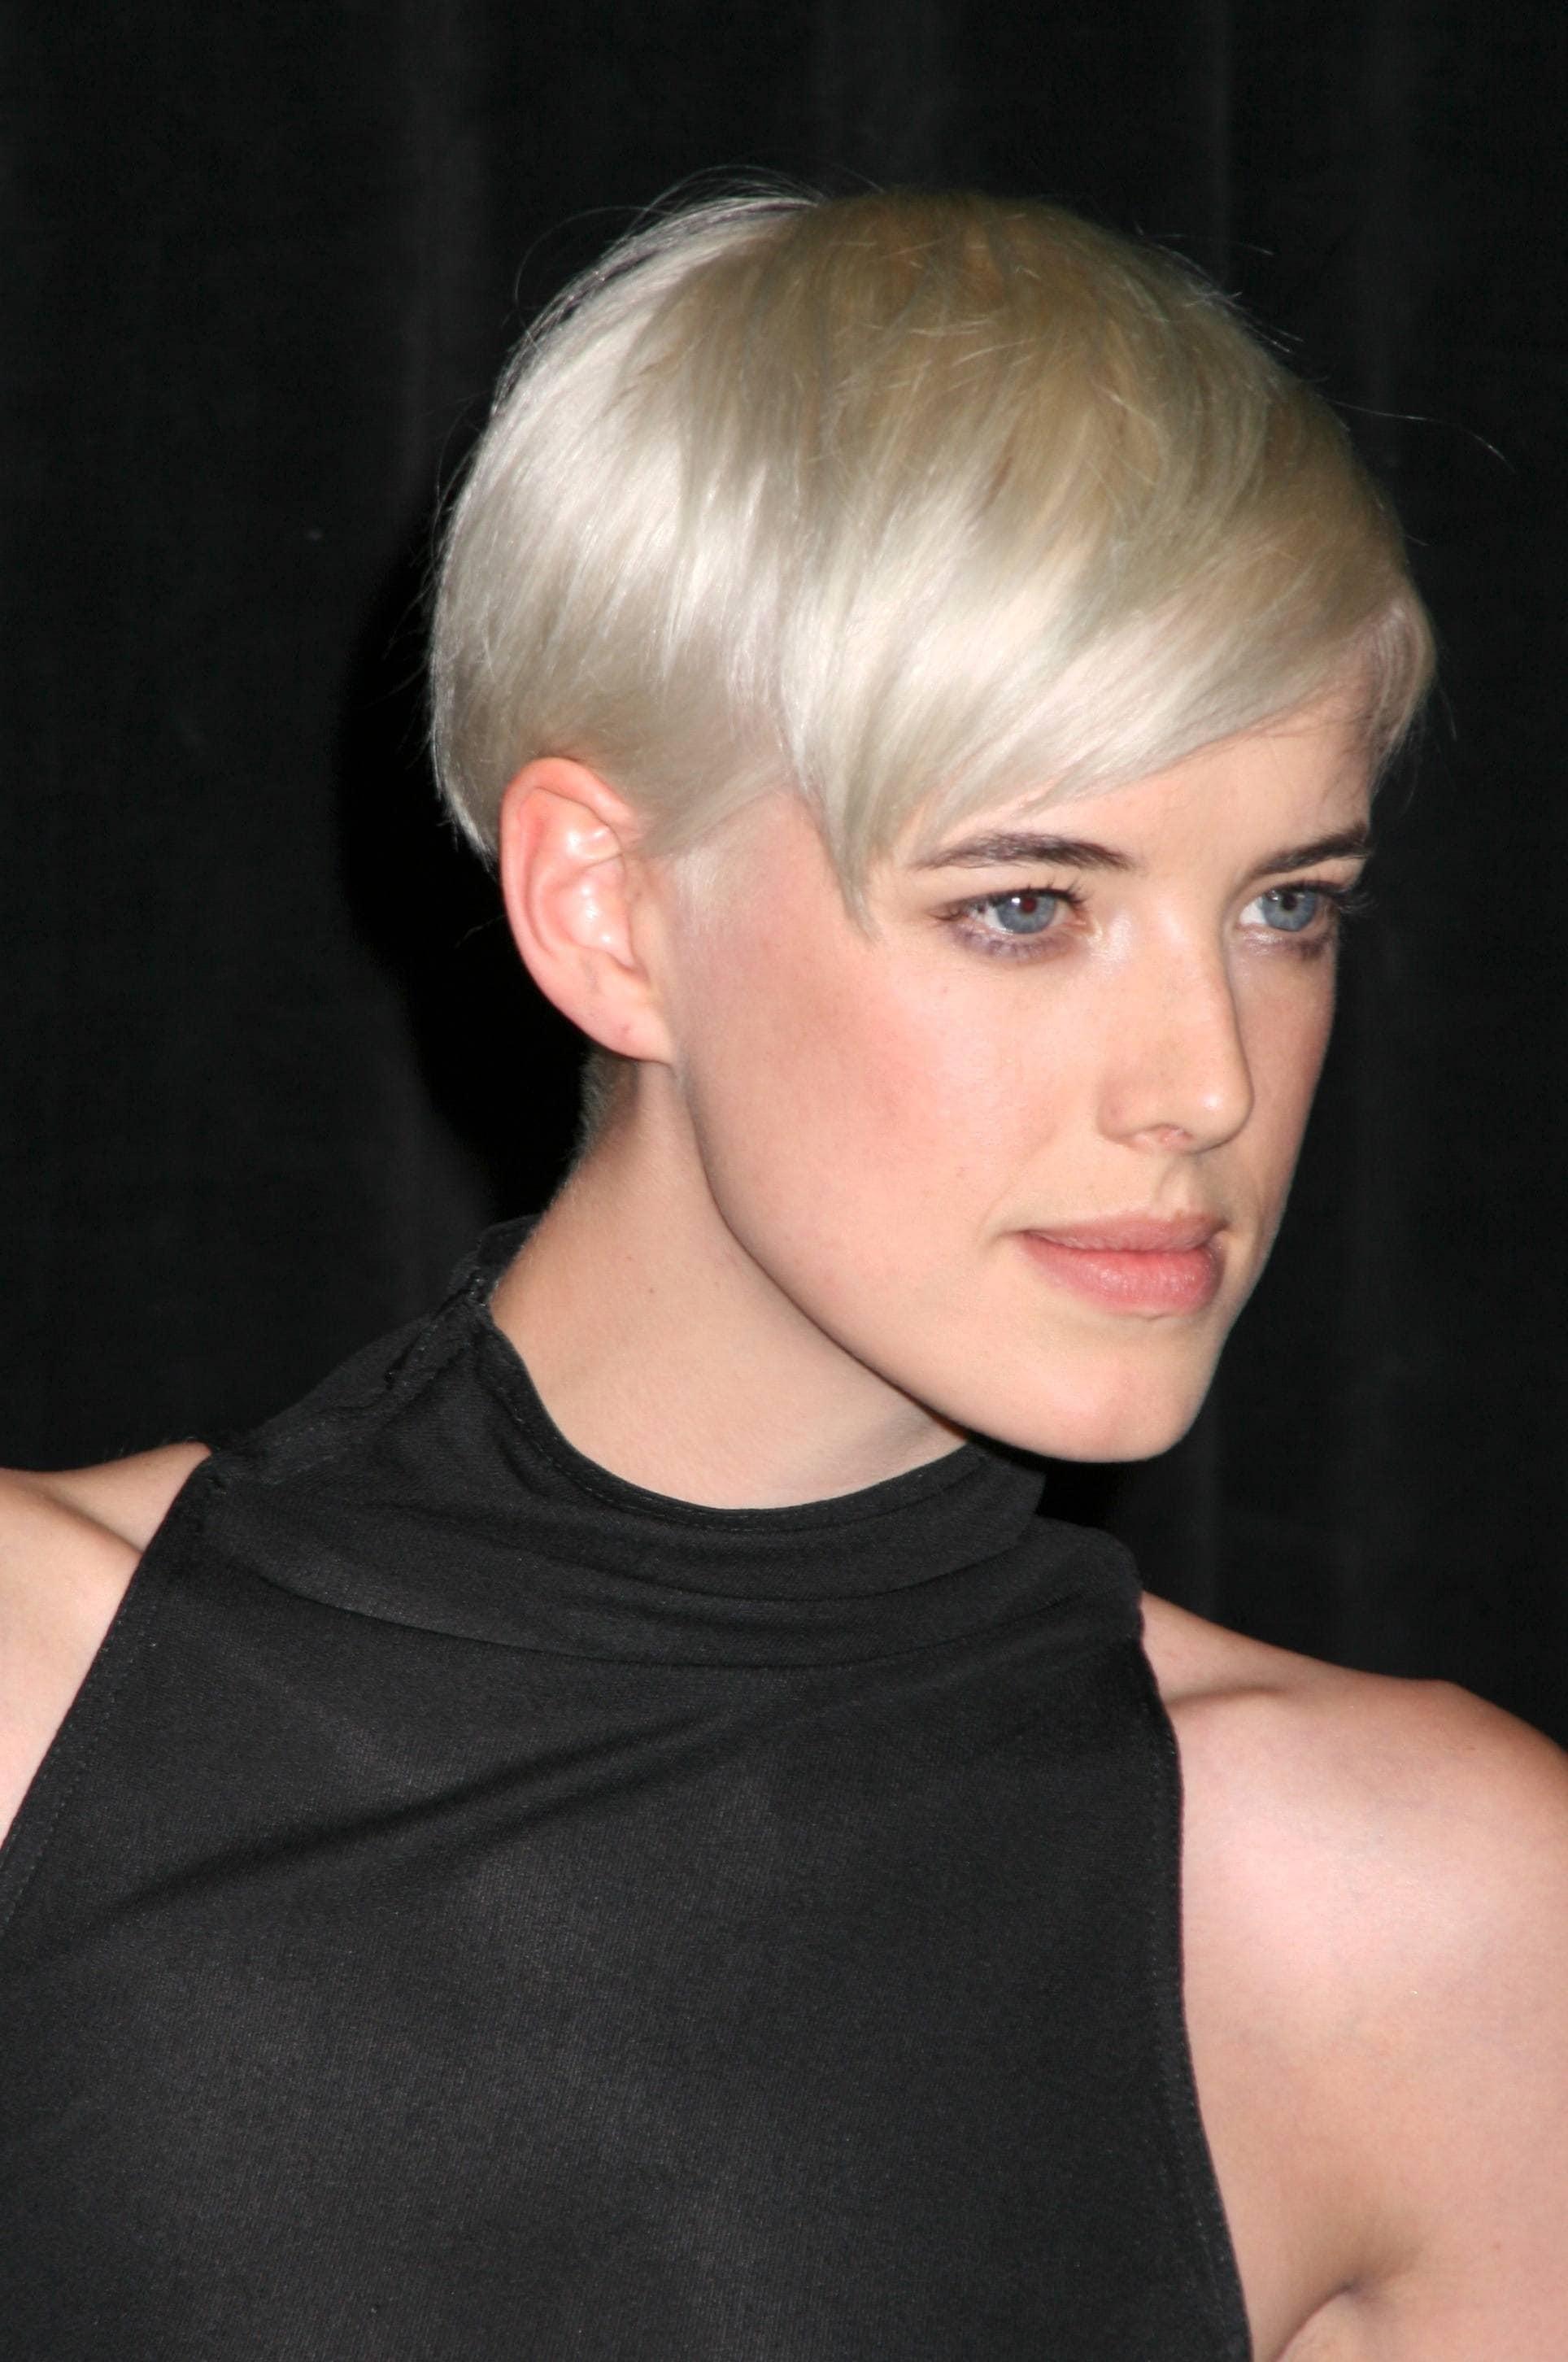 Agyness Deyn - 2008 - Short platinum blonde pixie cut - Rex